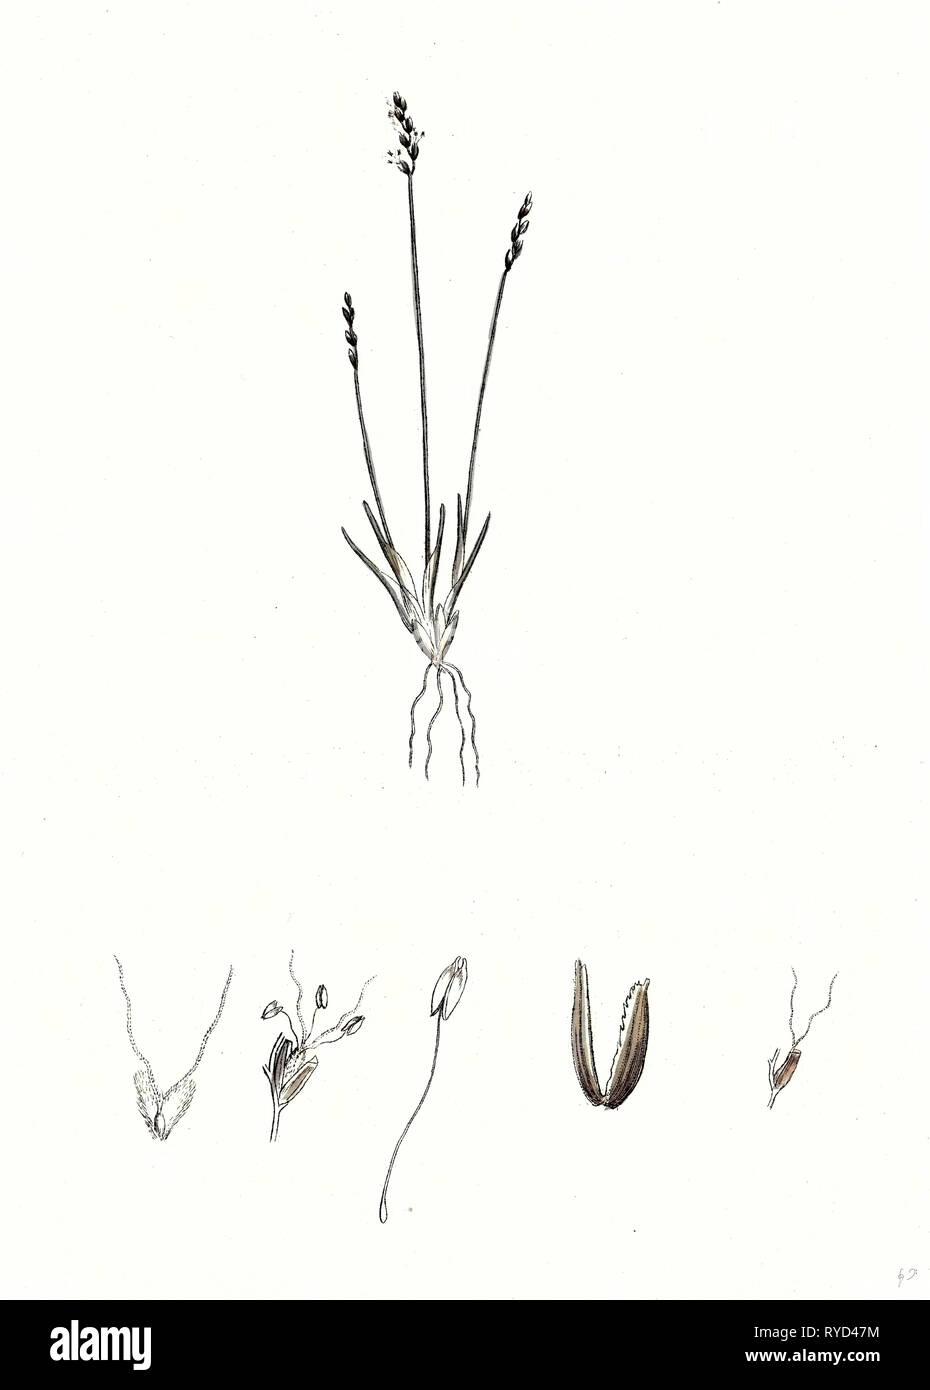 Chamagrostis Minima Early Sand-Grass - Stock Image